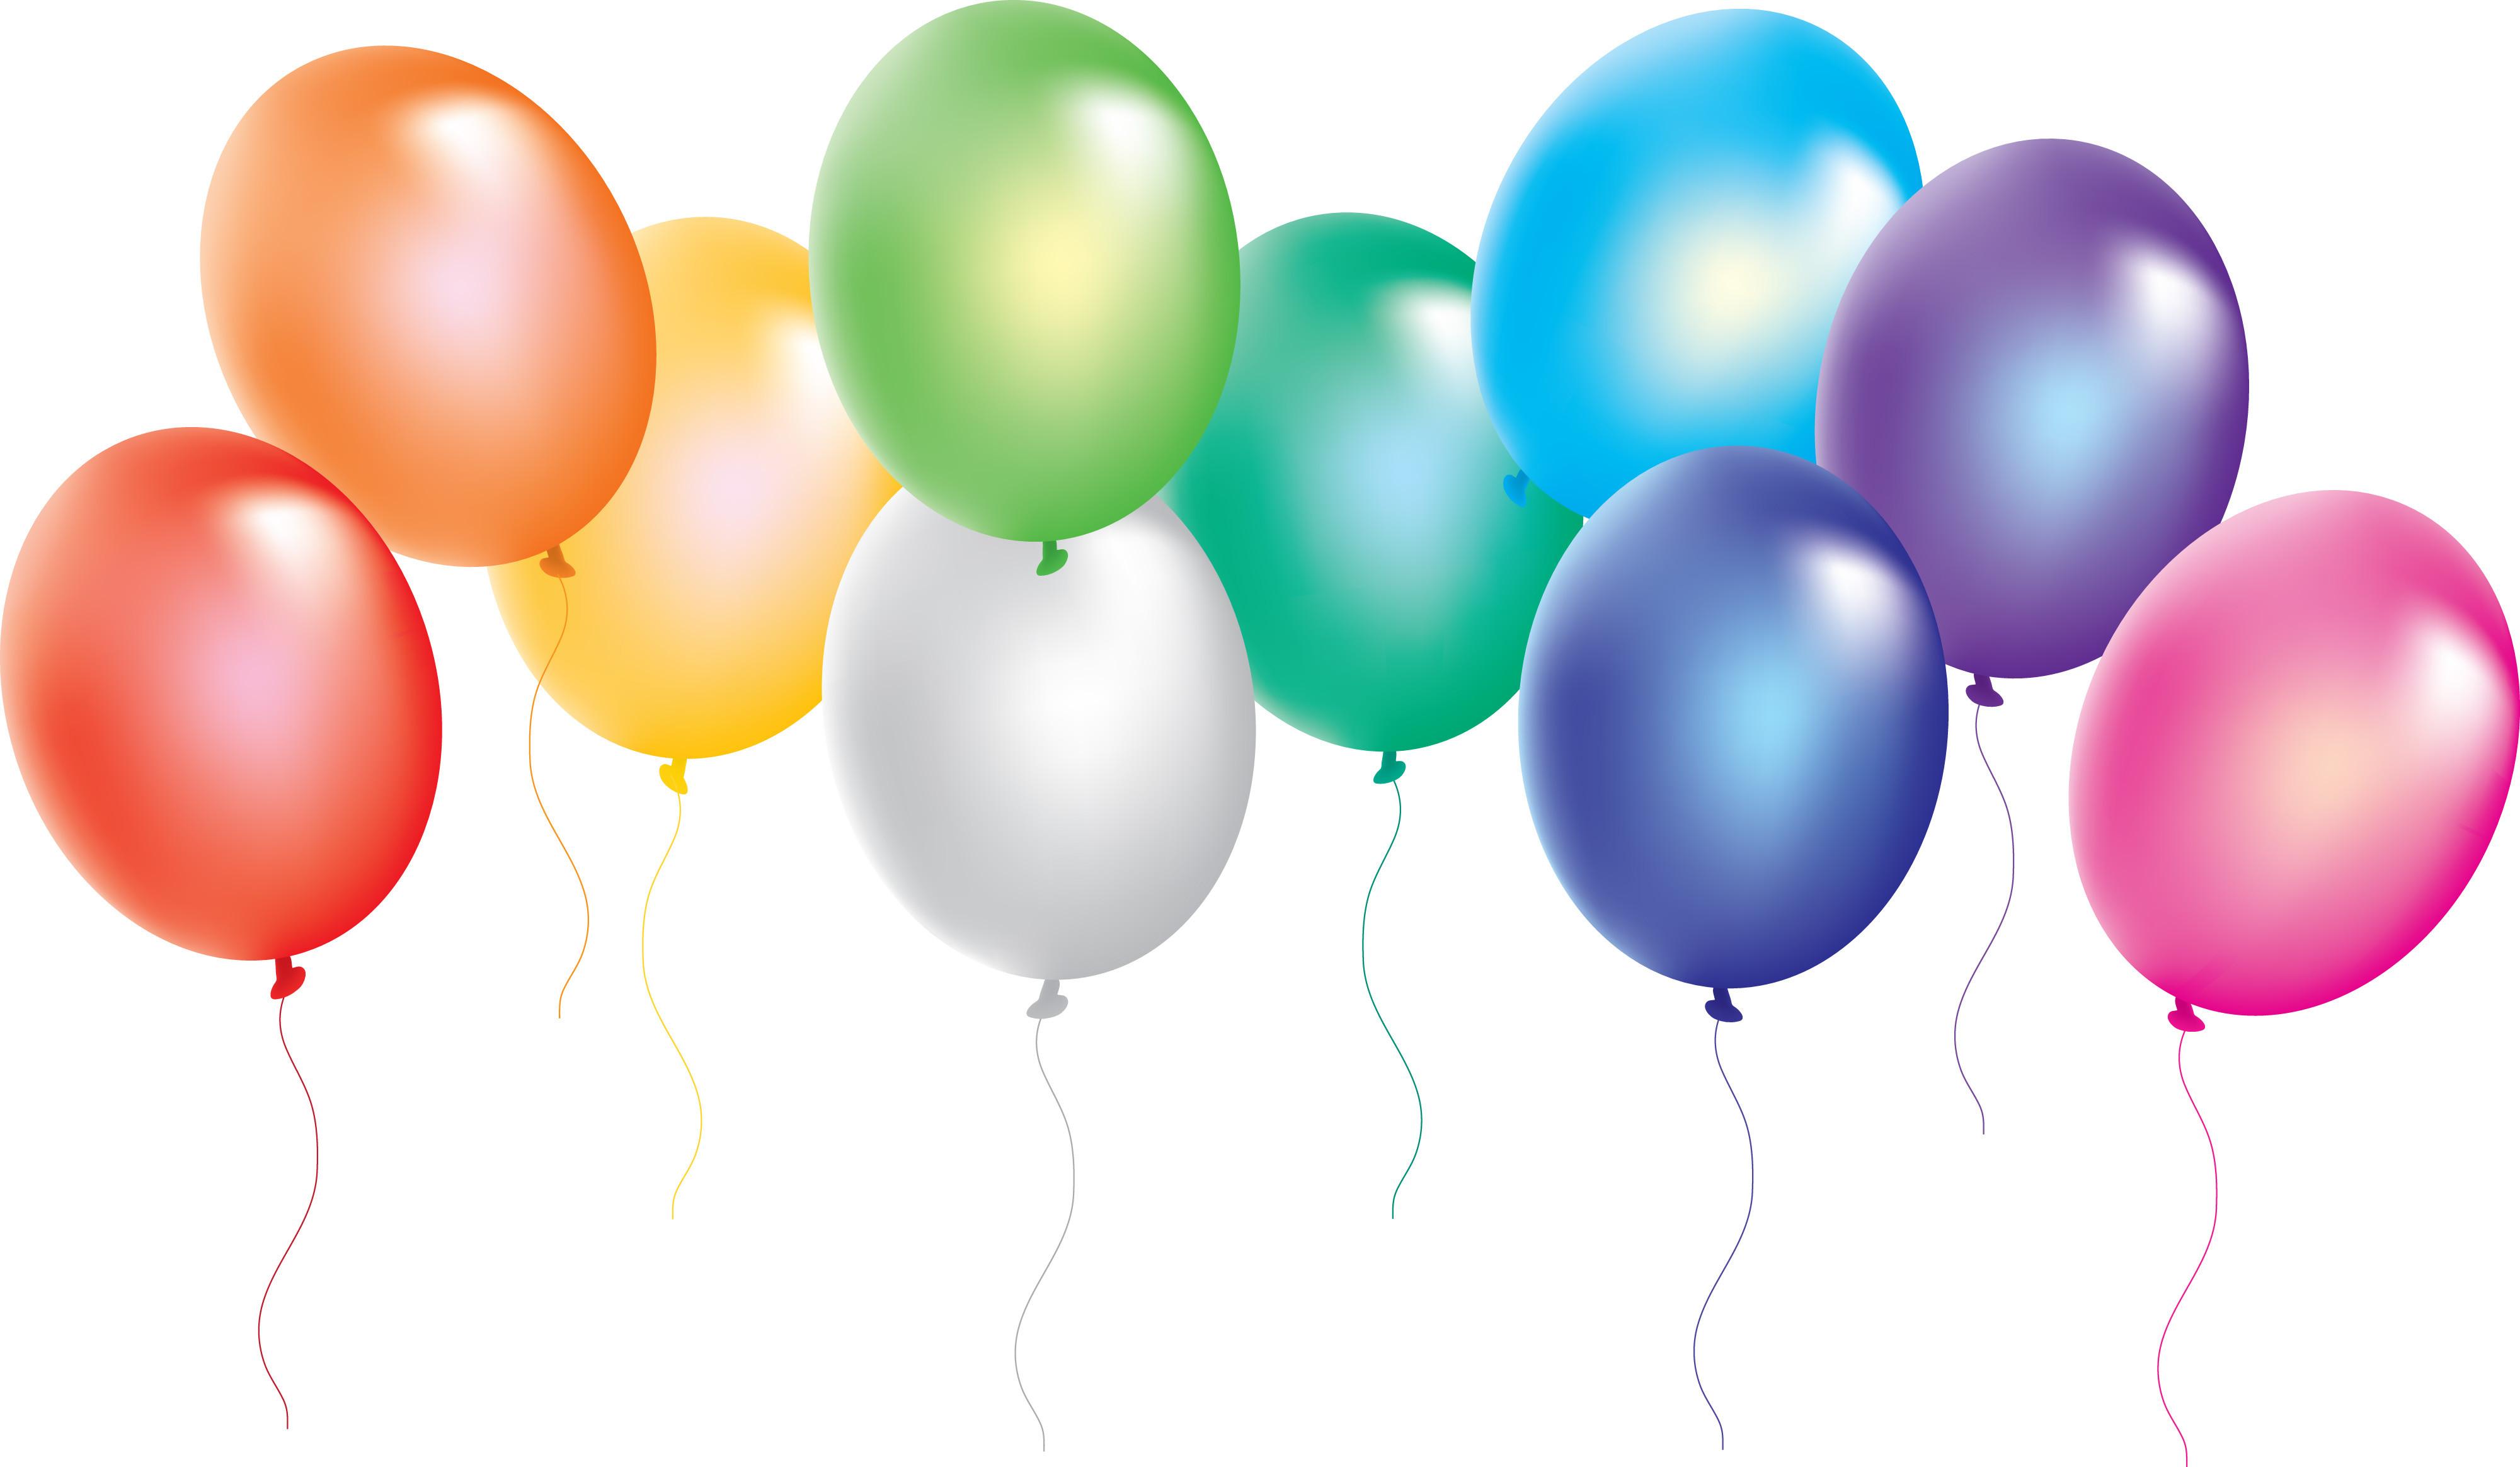 4000x2329 Happy Anniversary Download Wedding Anniversary Clip Art Free 2